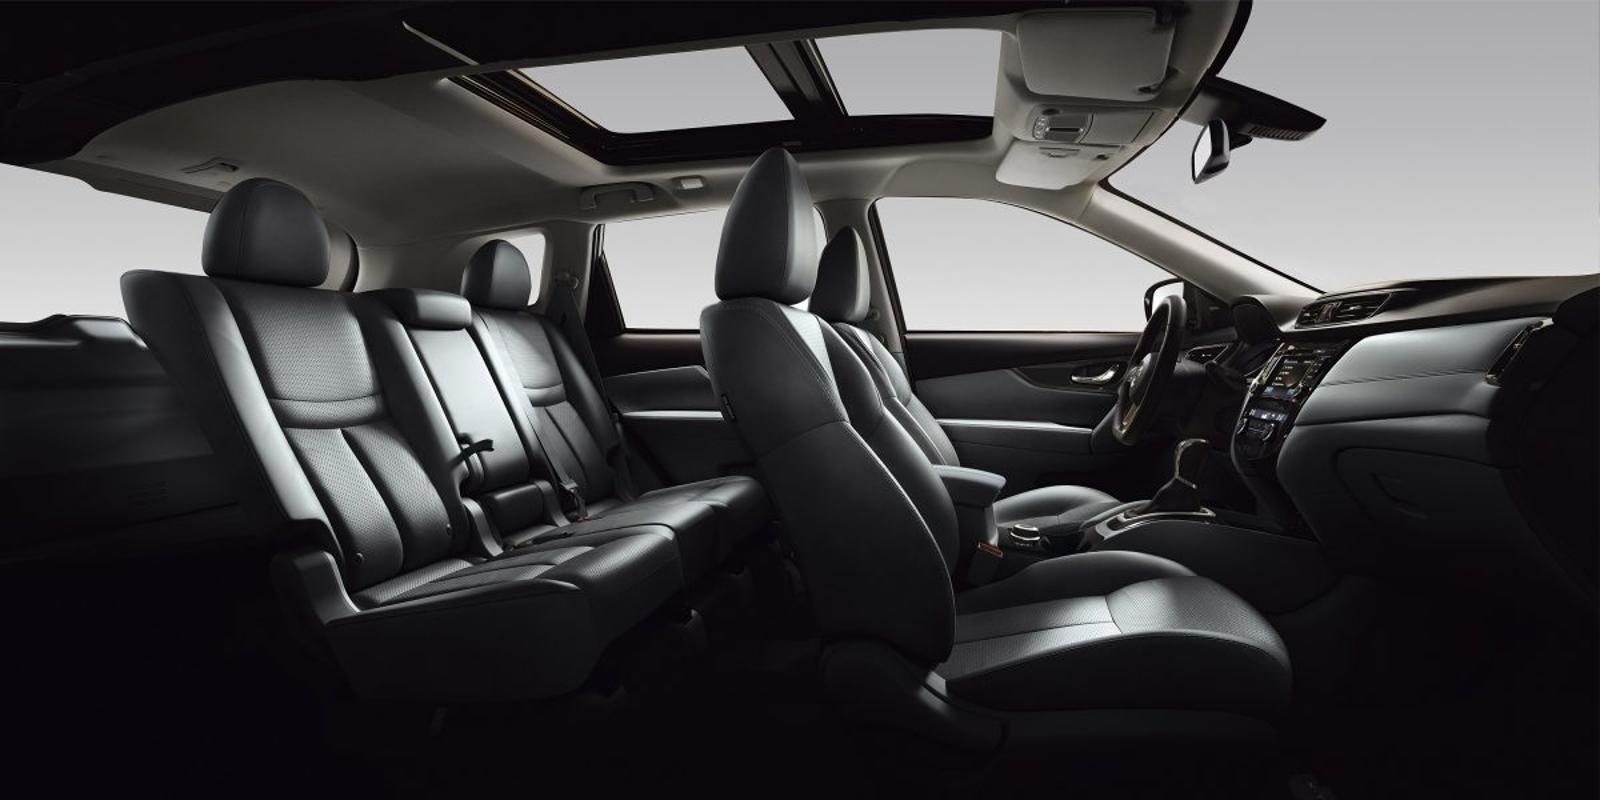 Interior Nissan X-trail